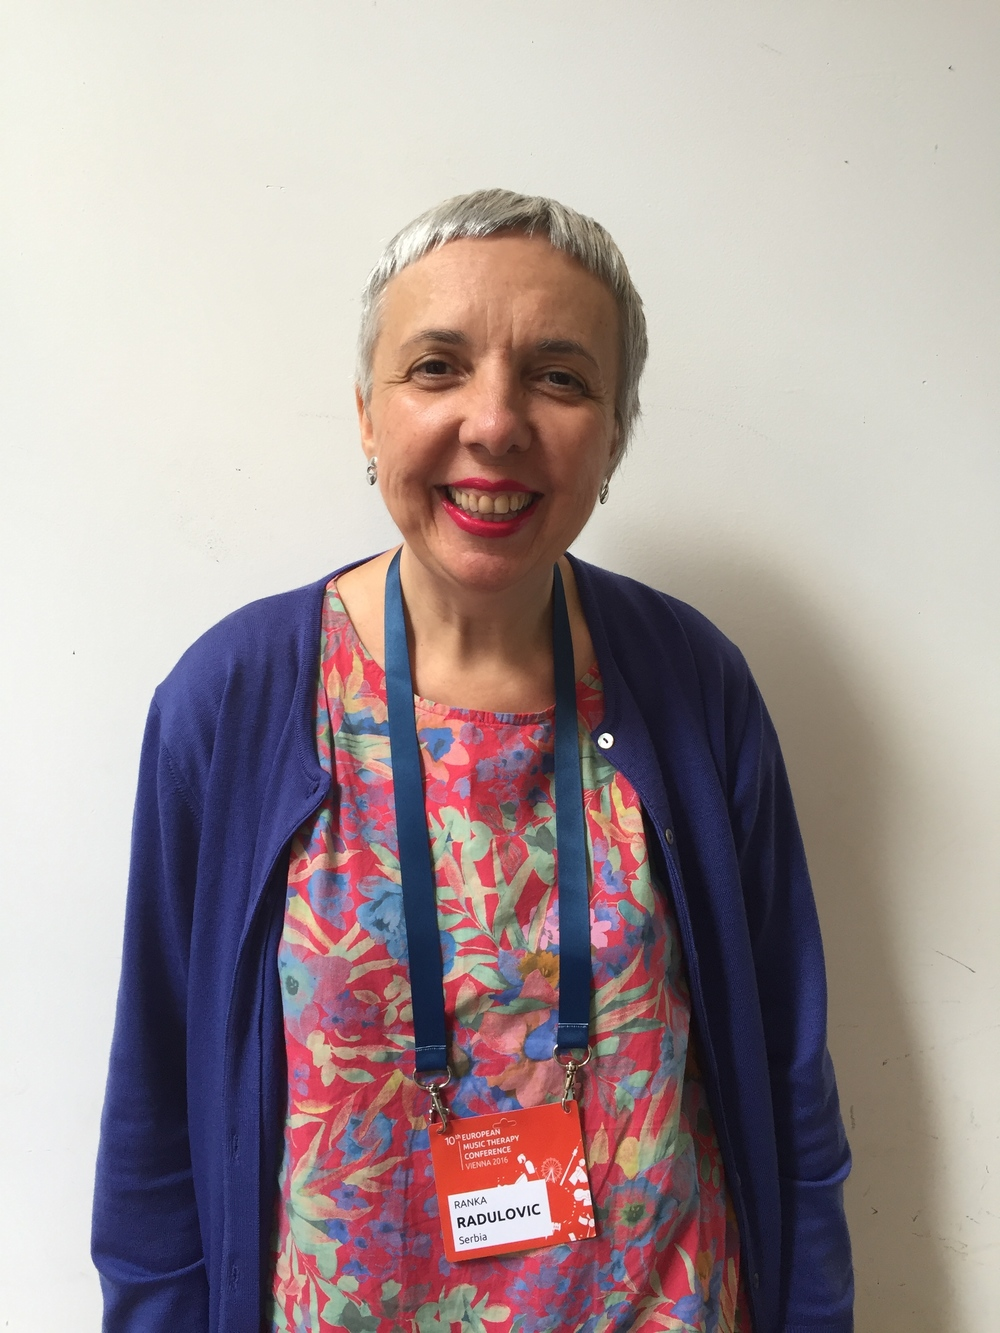 Serbia Dr. Ranka Radulovic